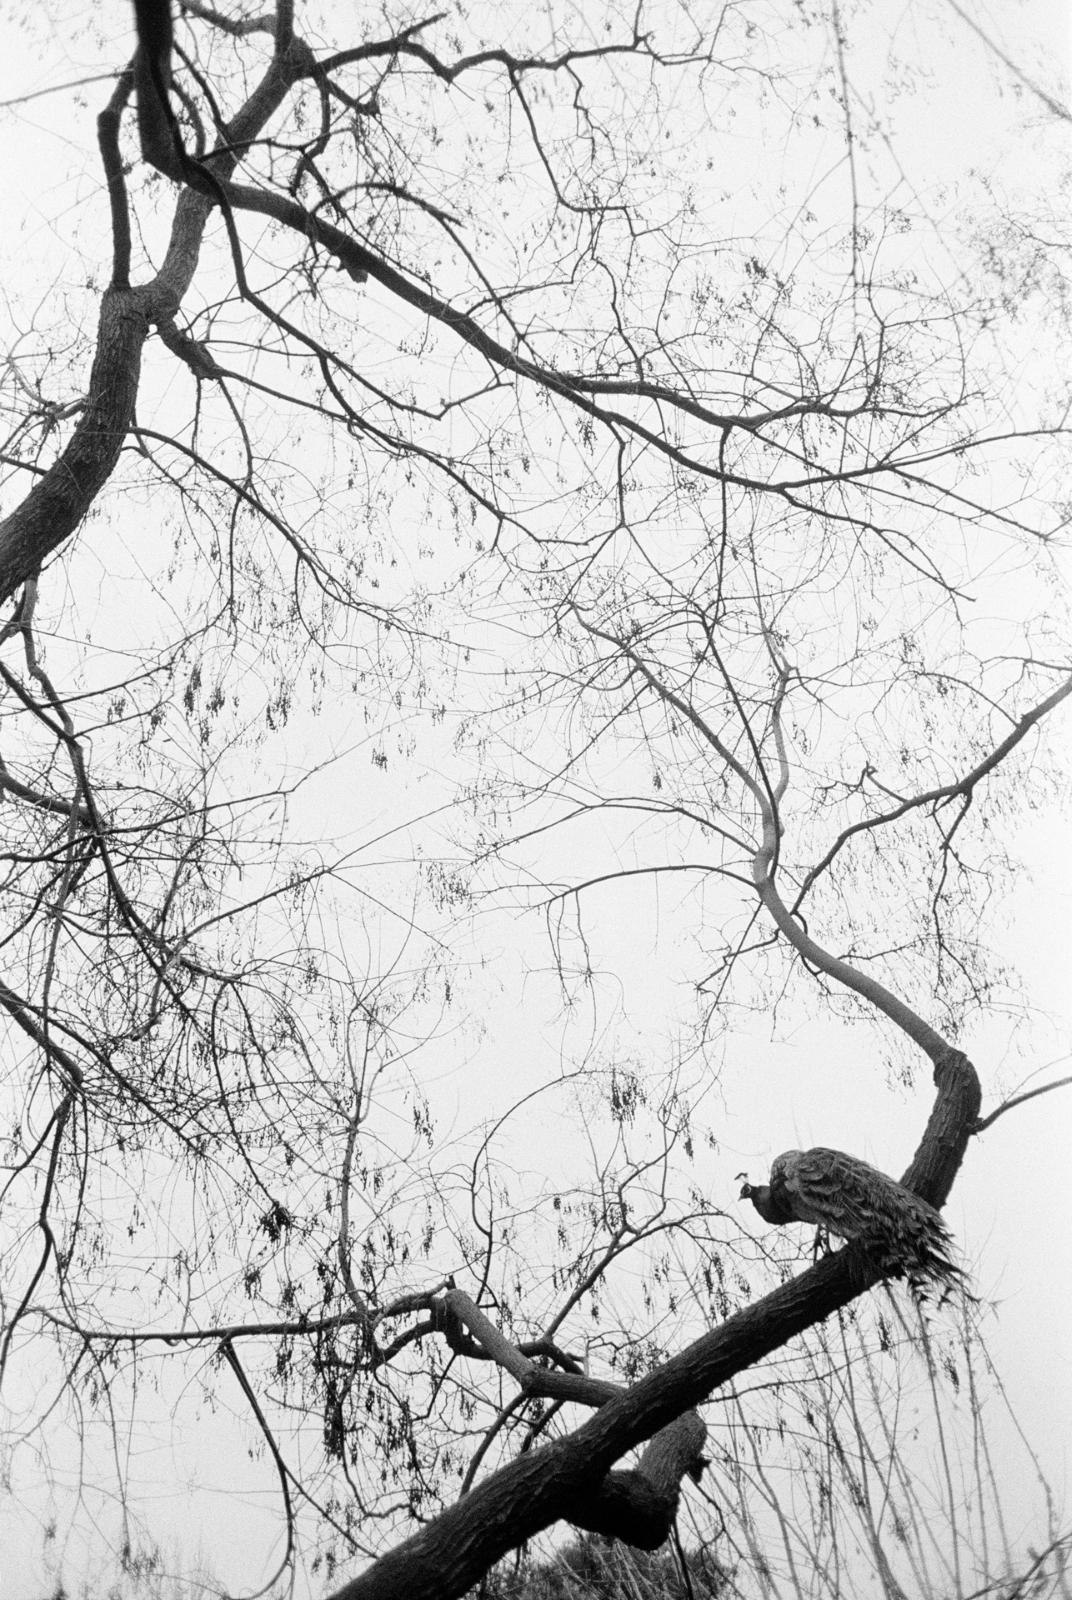 <p>&quot;Дихание&quot; на гръцкия фотограф Джон Демос</p>